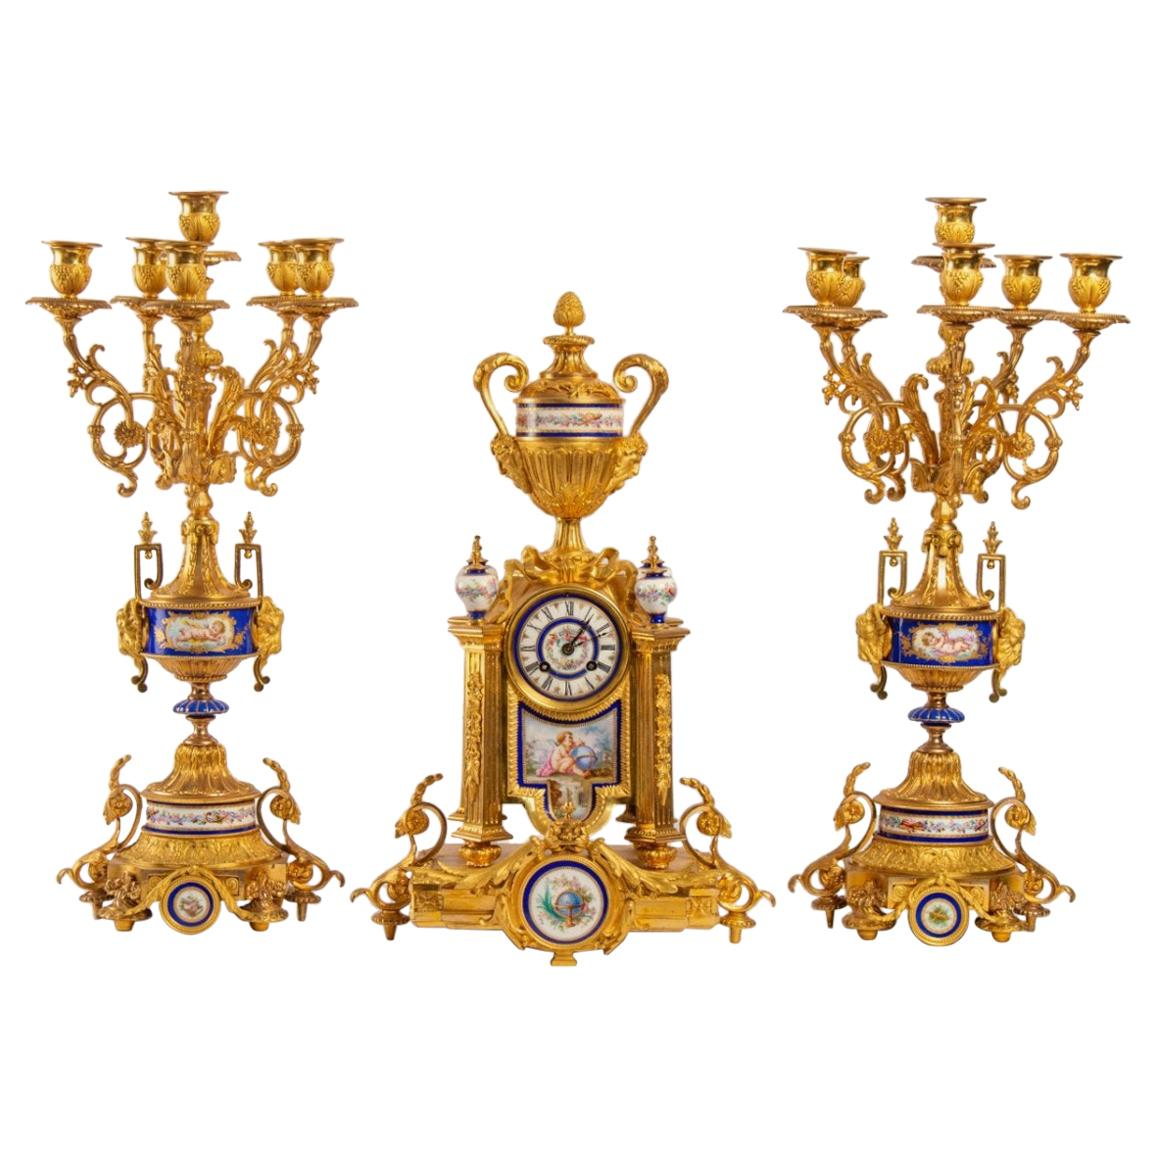 Gilt Bronze and Porcelain Mantel Set, Late 19th Century